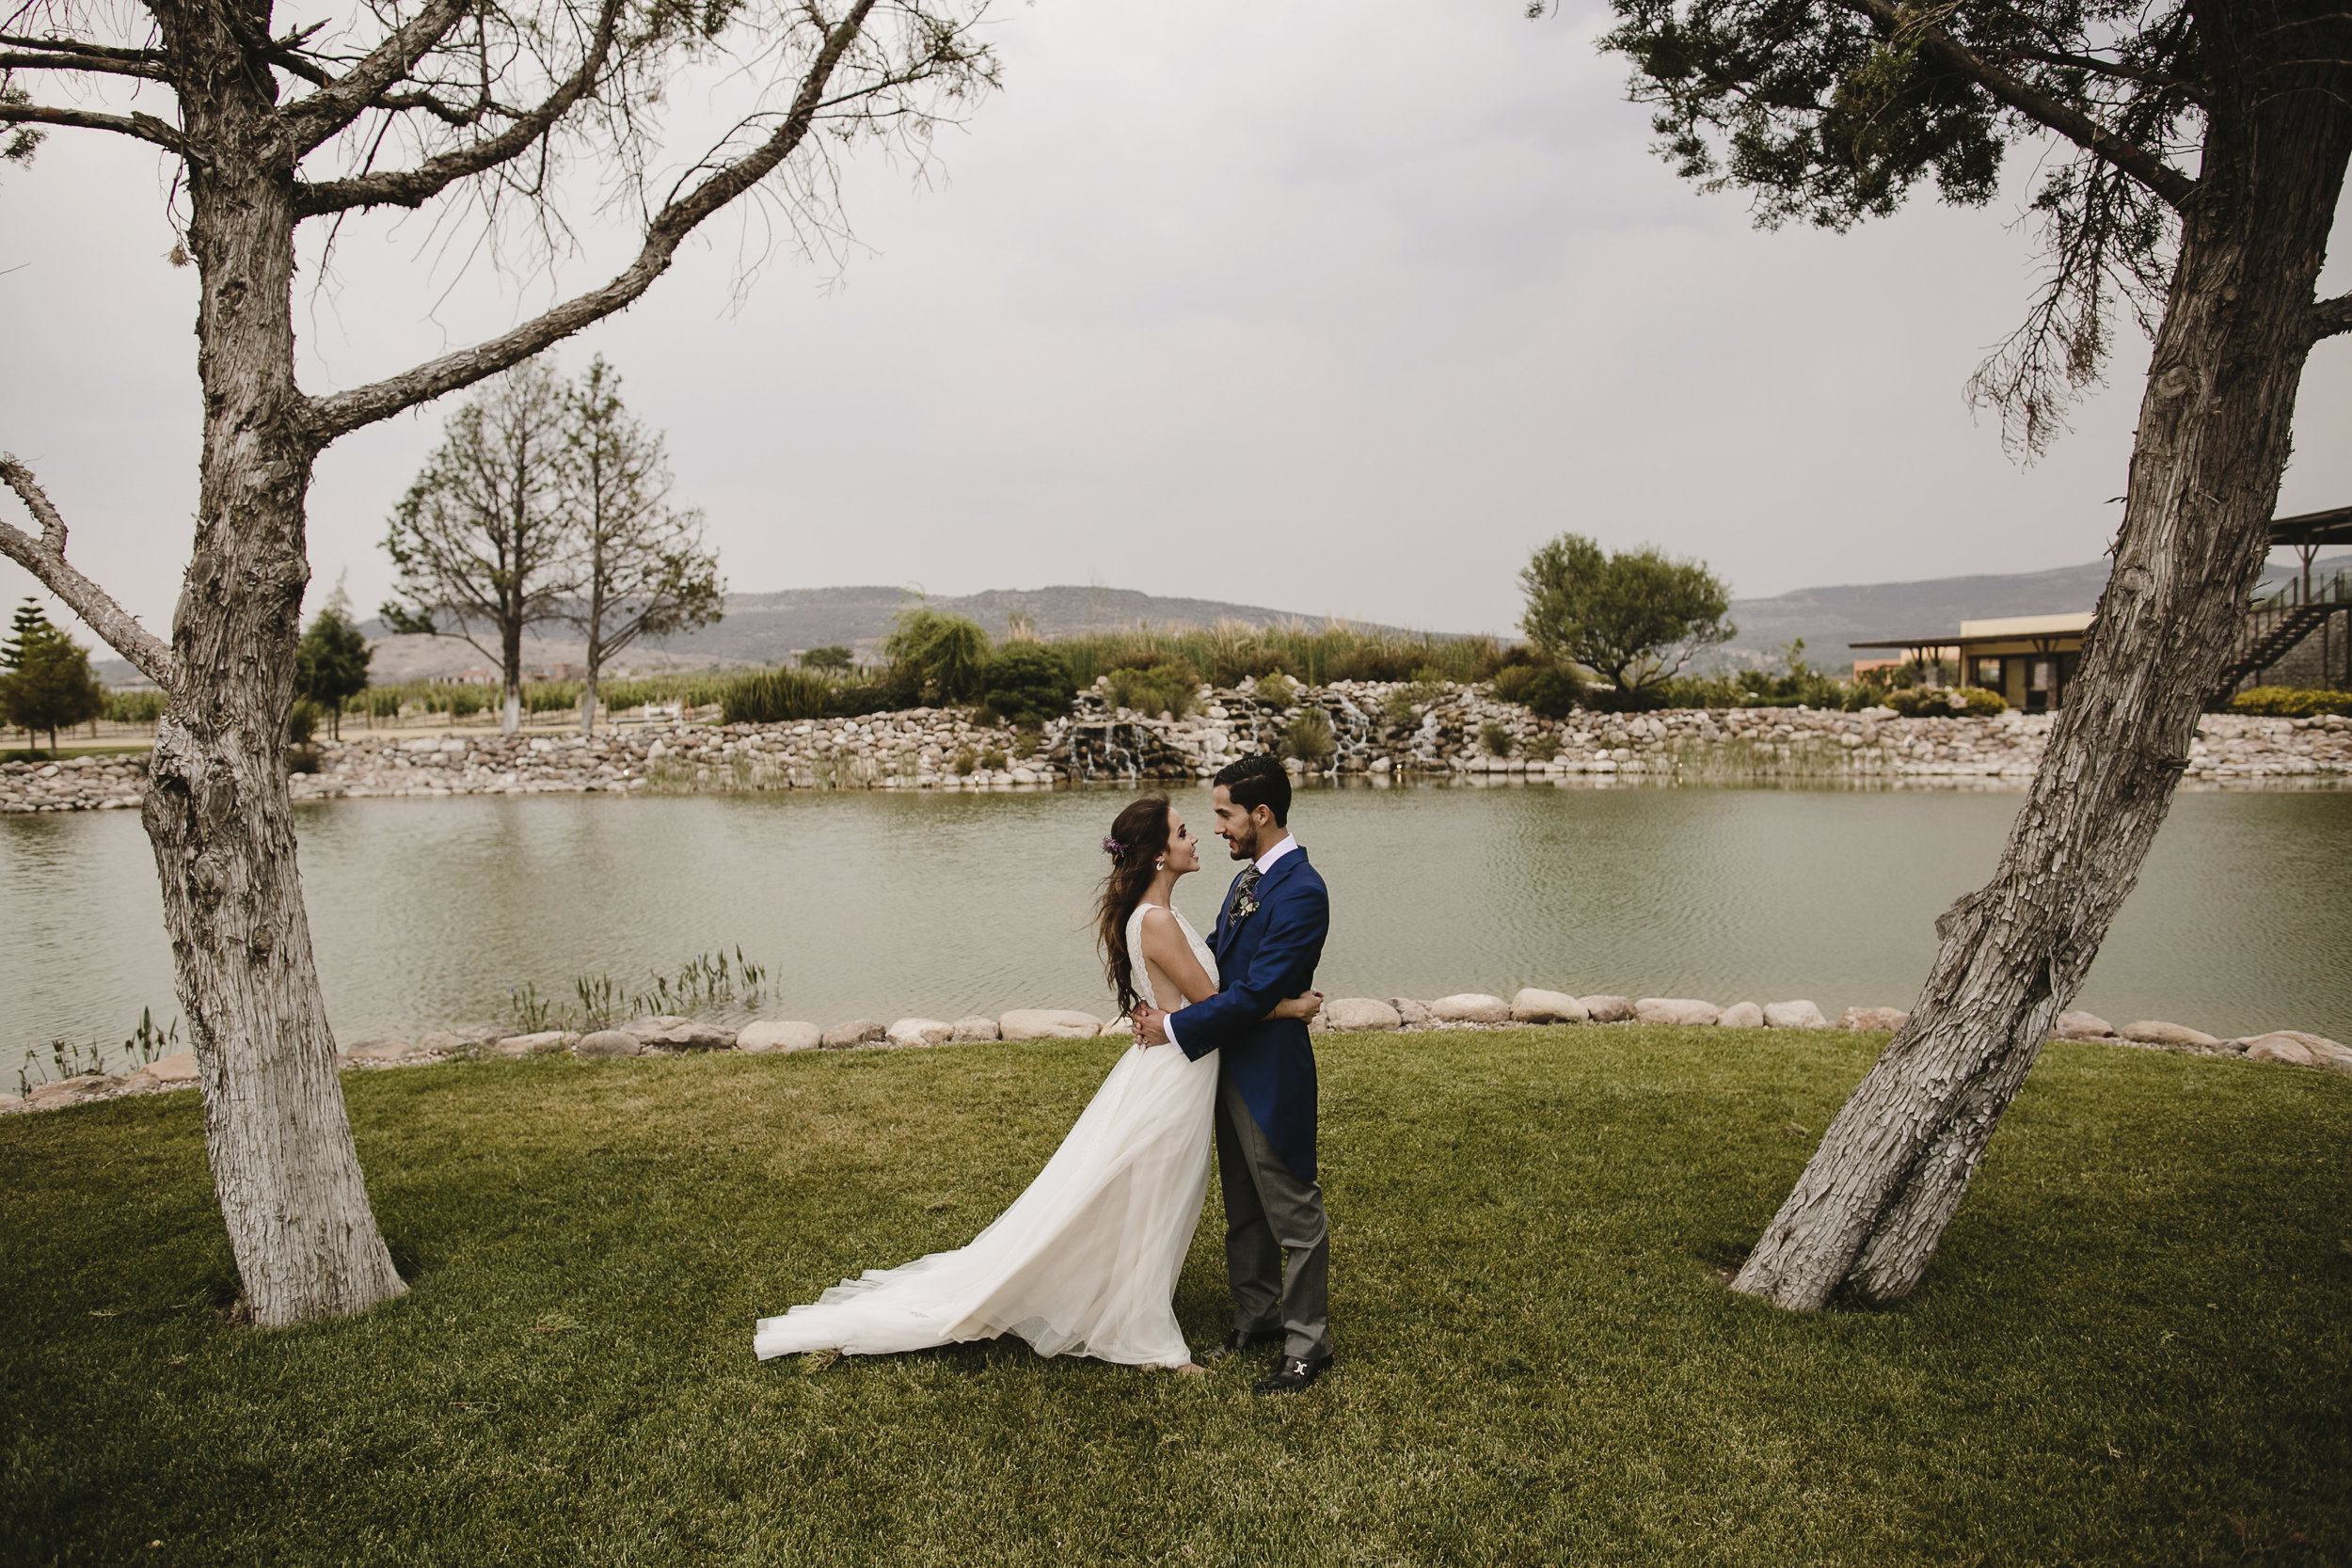 alfons_flores_destination_wedding_photography_mavi_david-1247.JPG